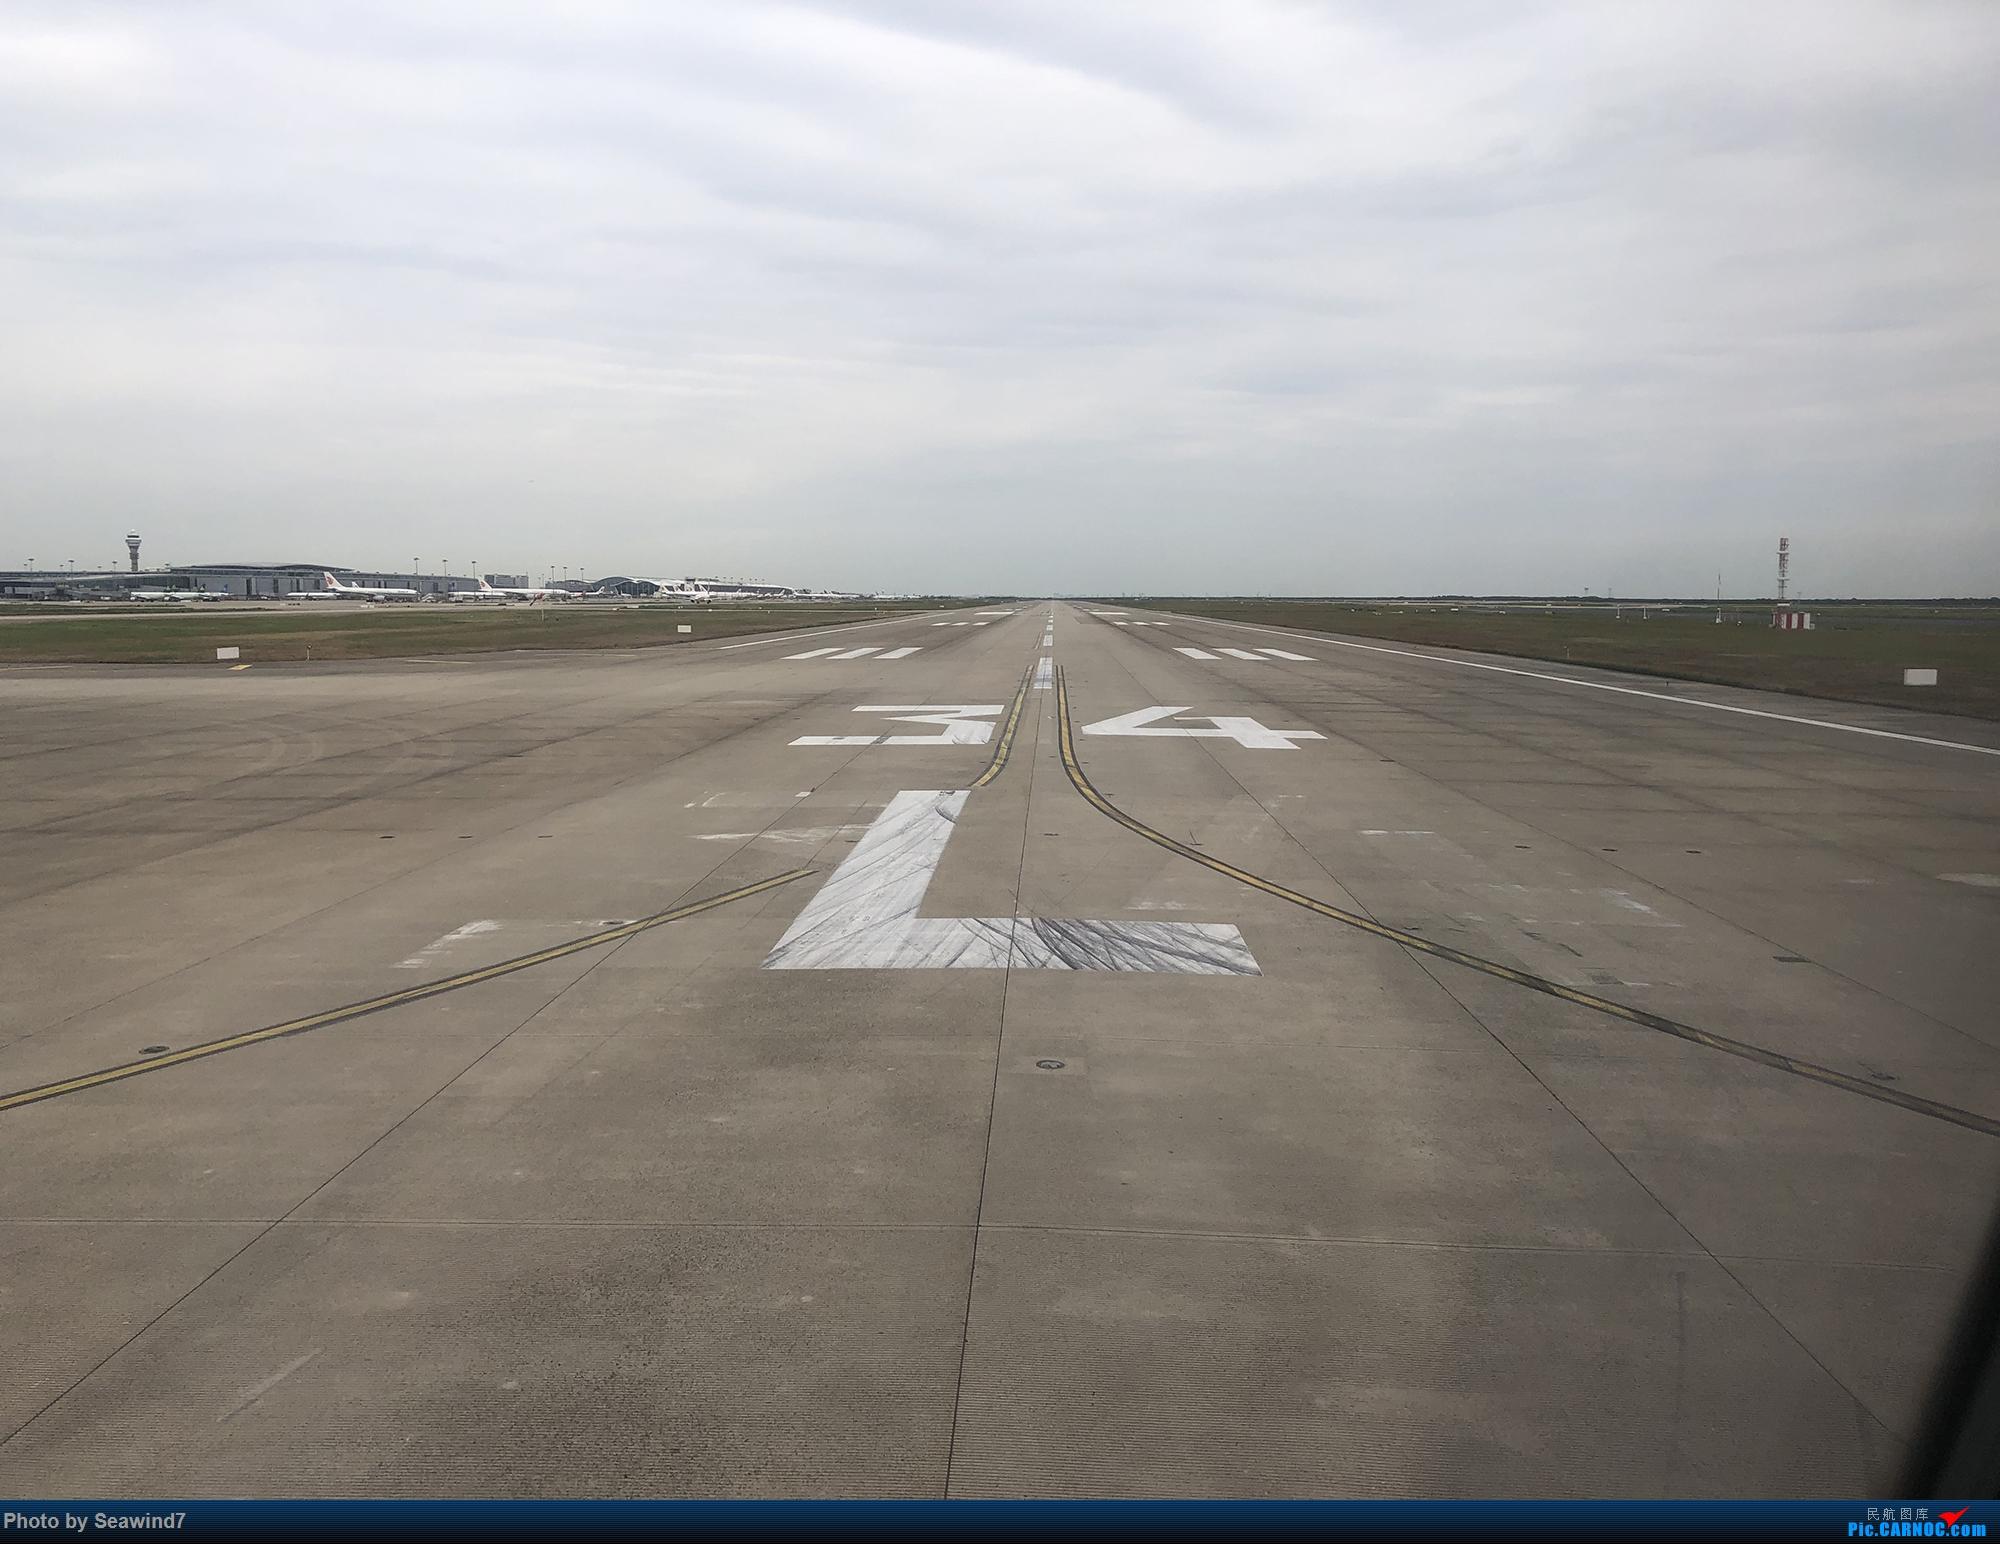 Re:[Seawind7游记第九弹]长春往返,南航明珠经济舱体验    中国上海浦东国际机场